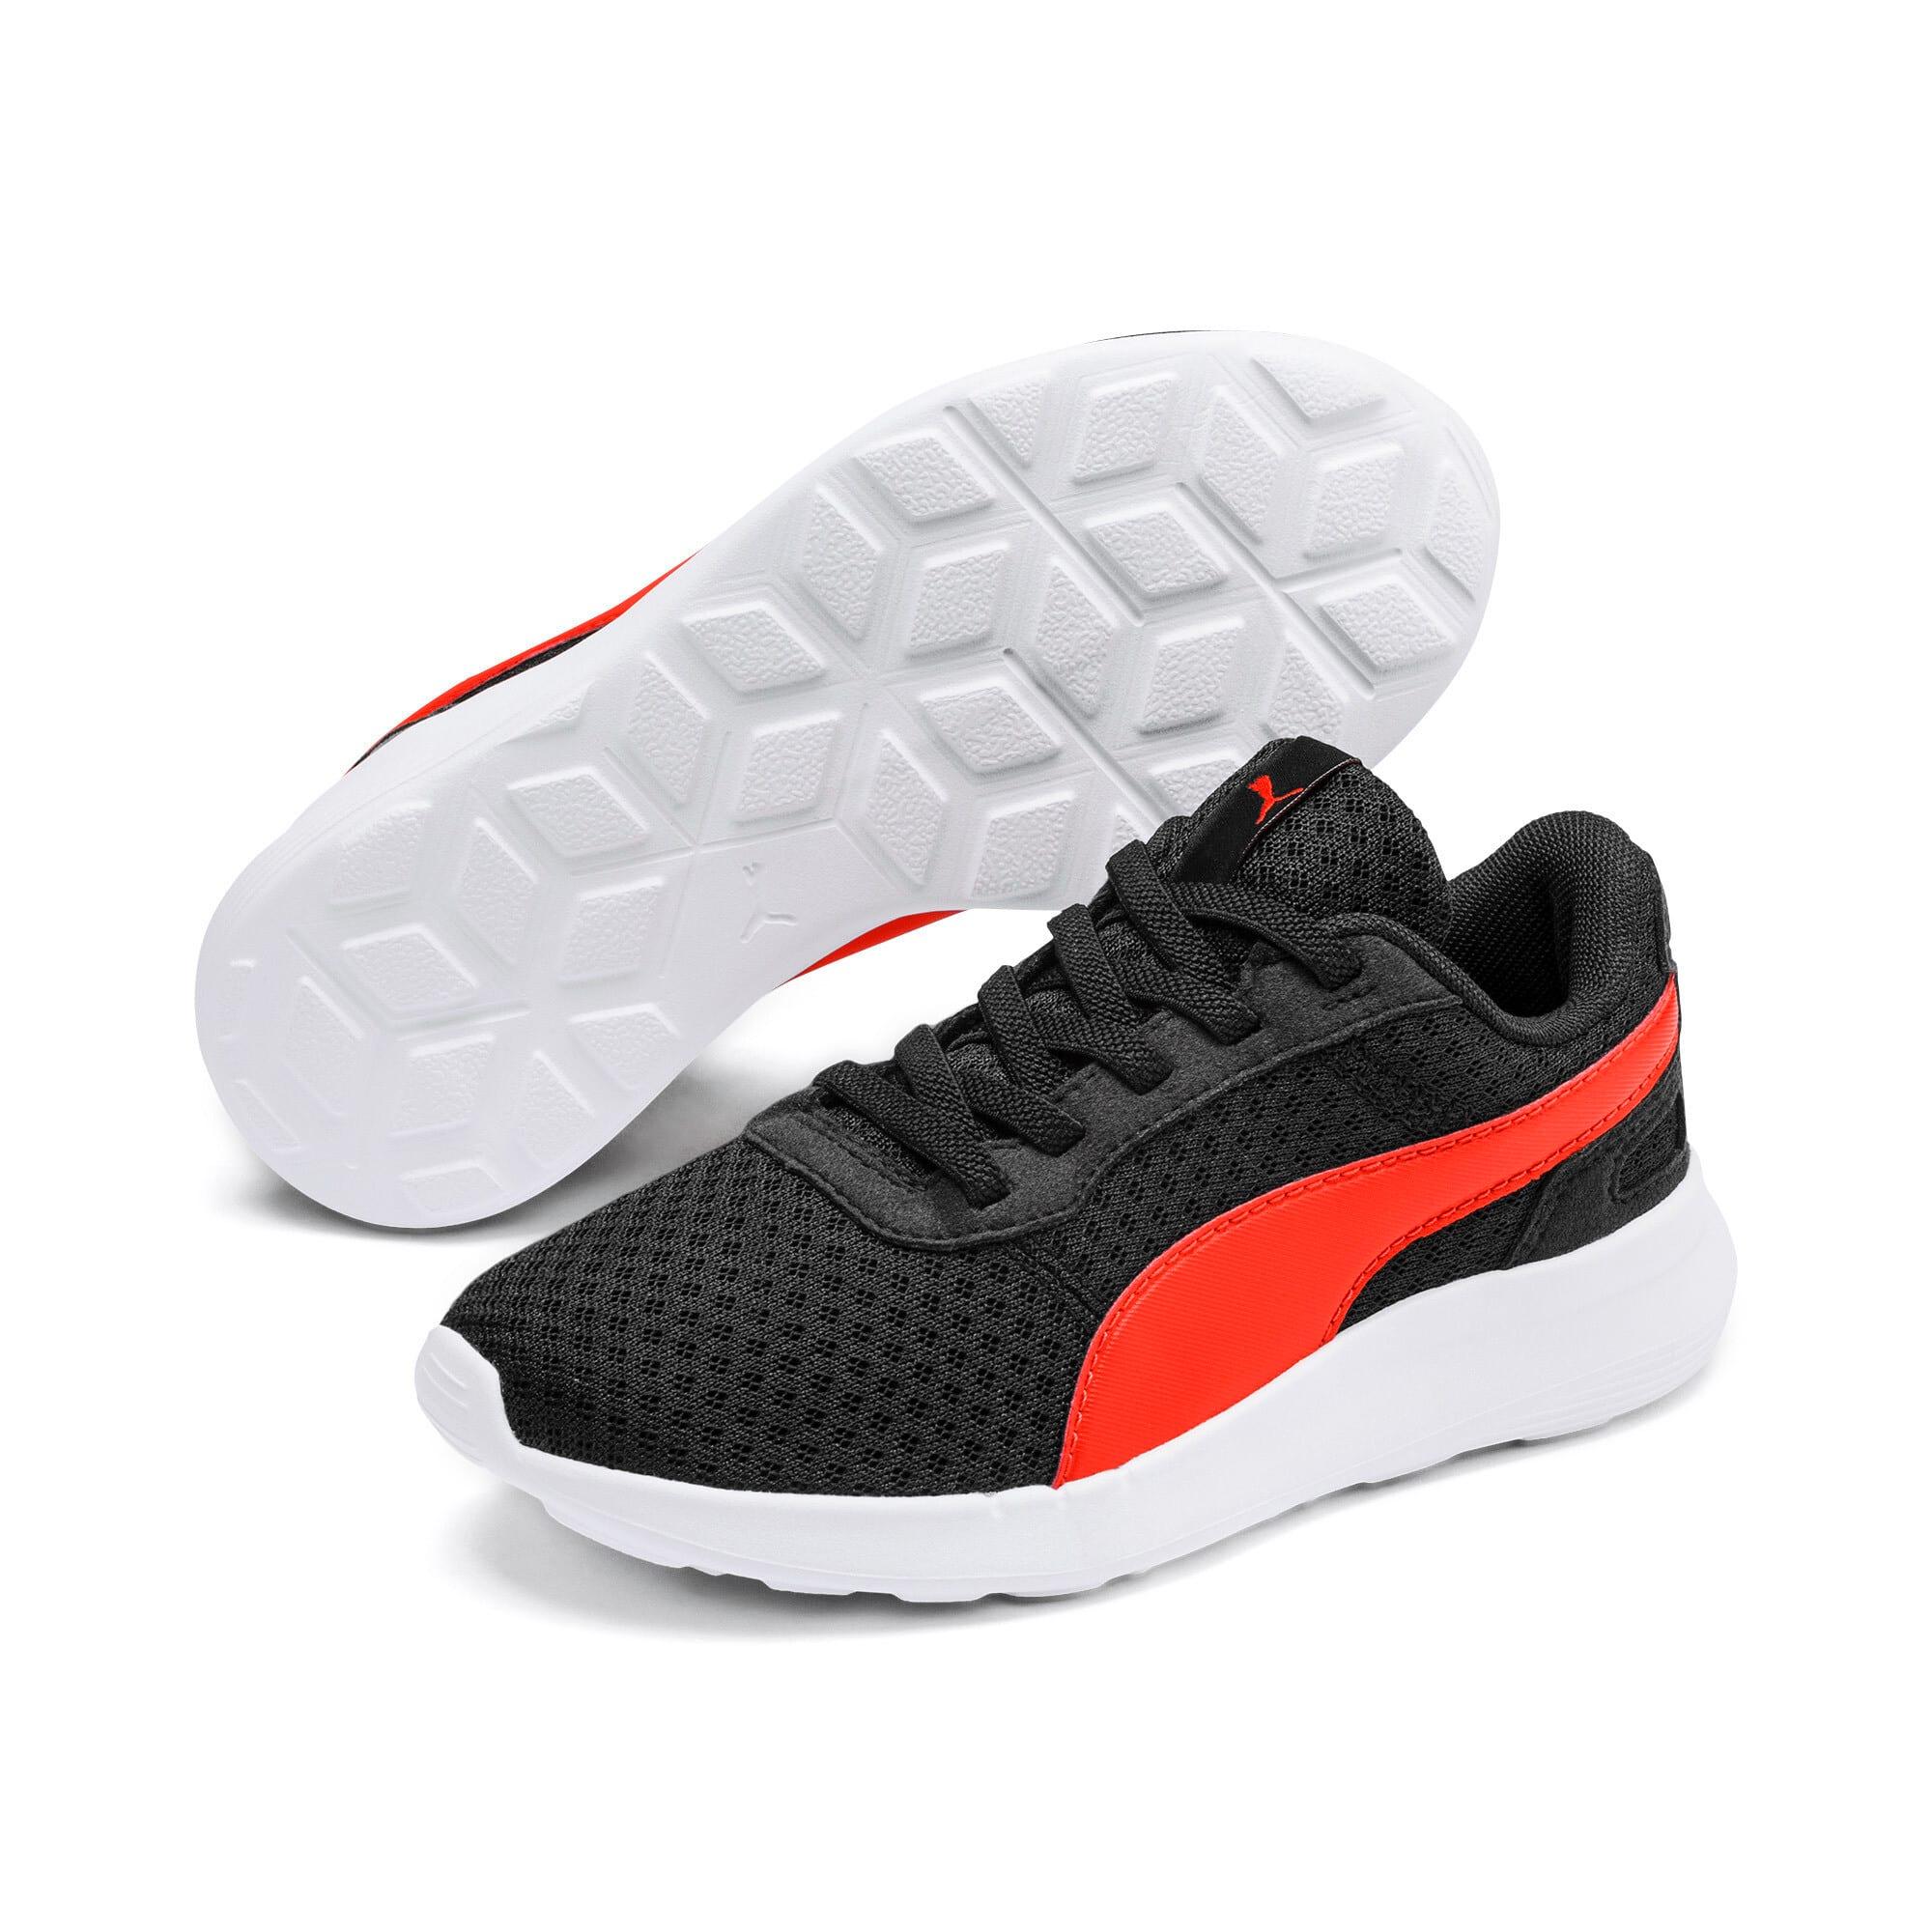 Thumbnail 2 of ST Activate Sneakers PS, Puma Black-Cherry Tomato, medium